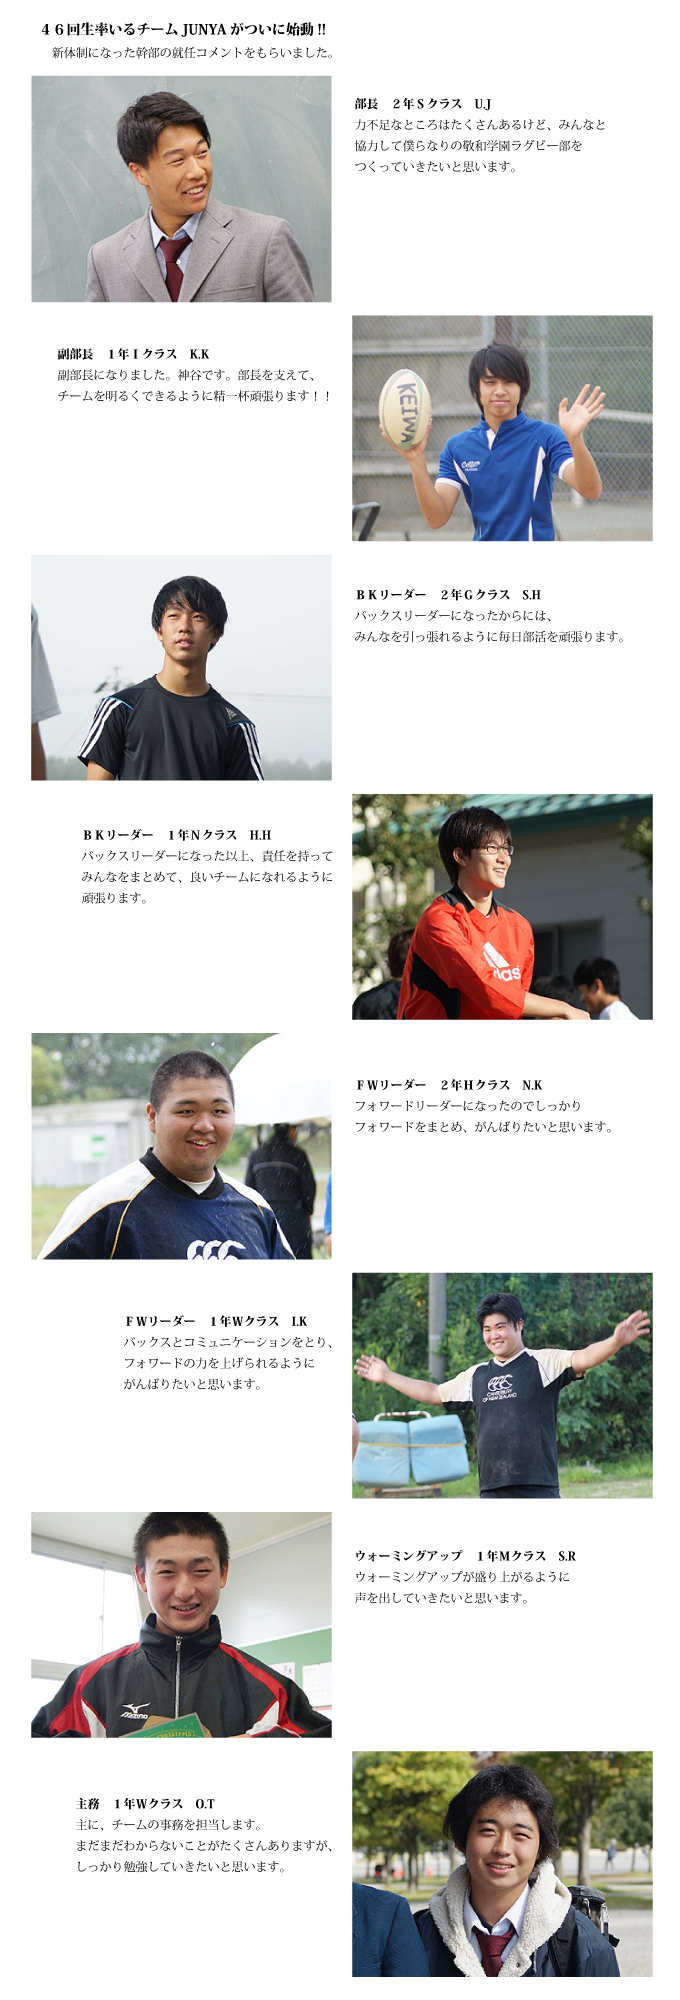 rugby_member